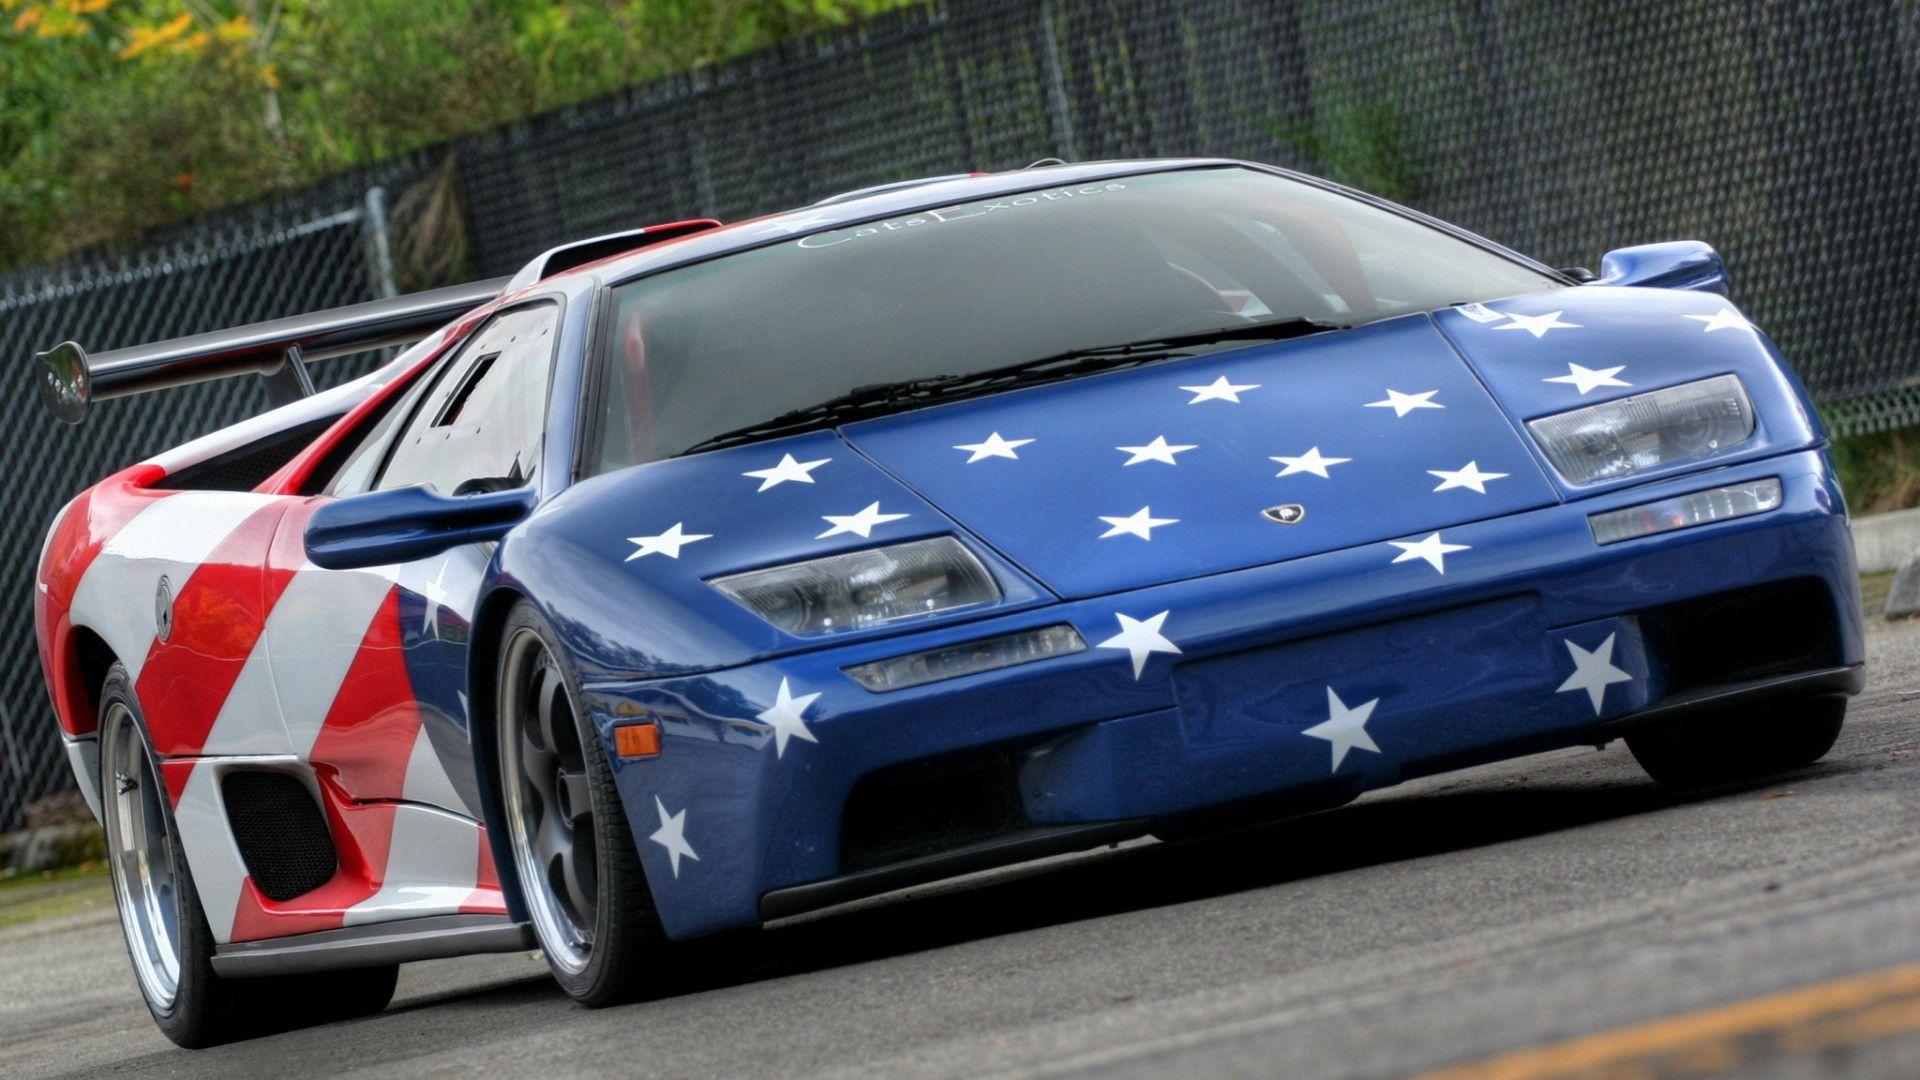 8b44e5c1763373d9fa94e5fa73c90d25 Marvelous Photo Ferrari Mondial 8 Quattrovalvole Rouge Occasion Cars Trend